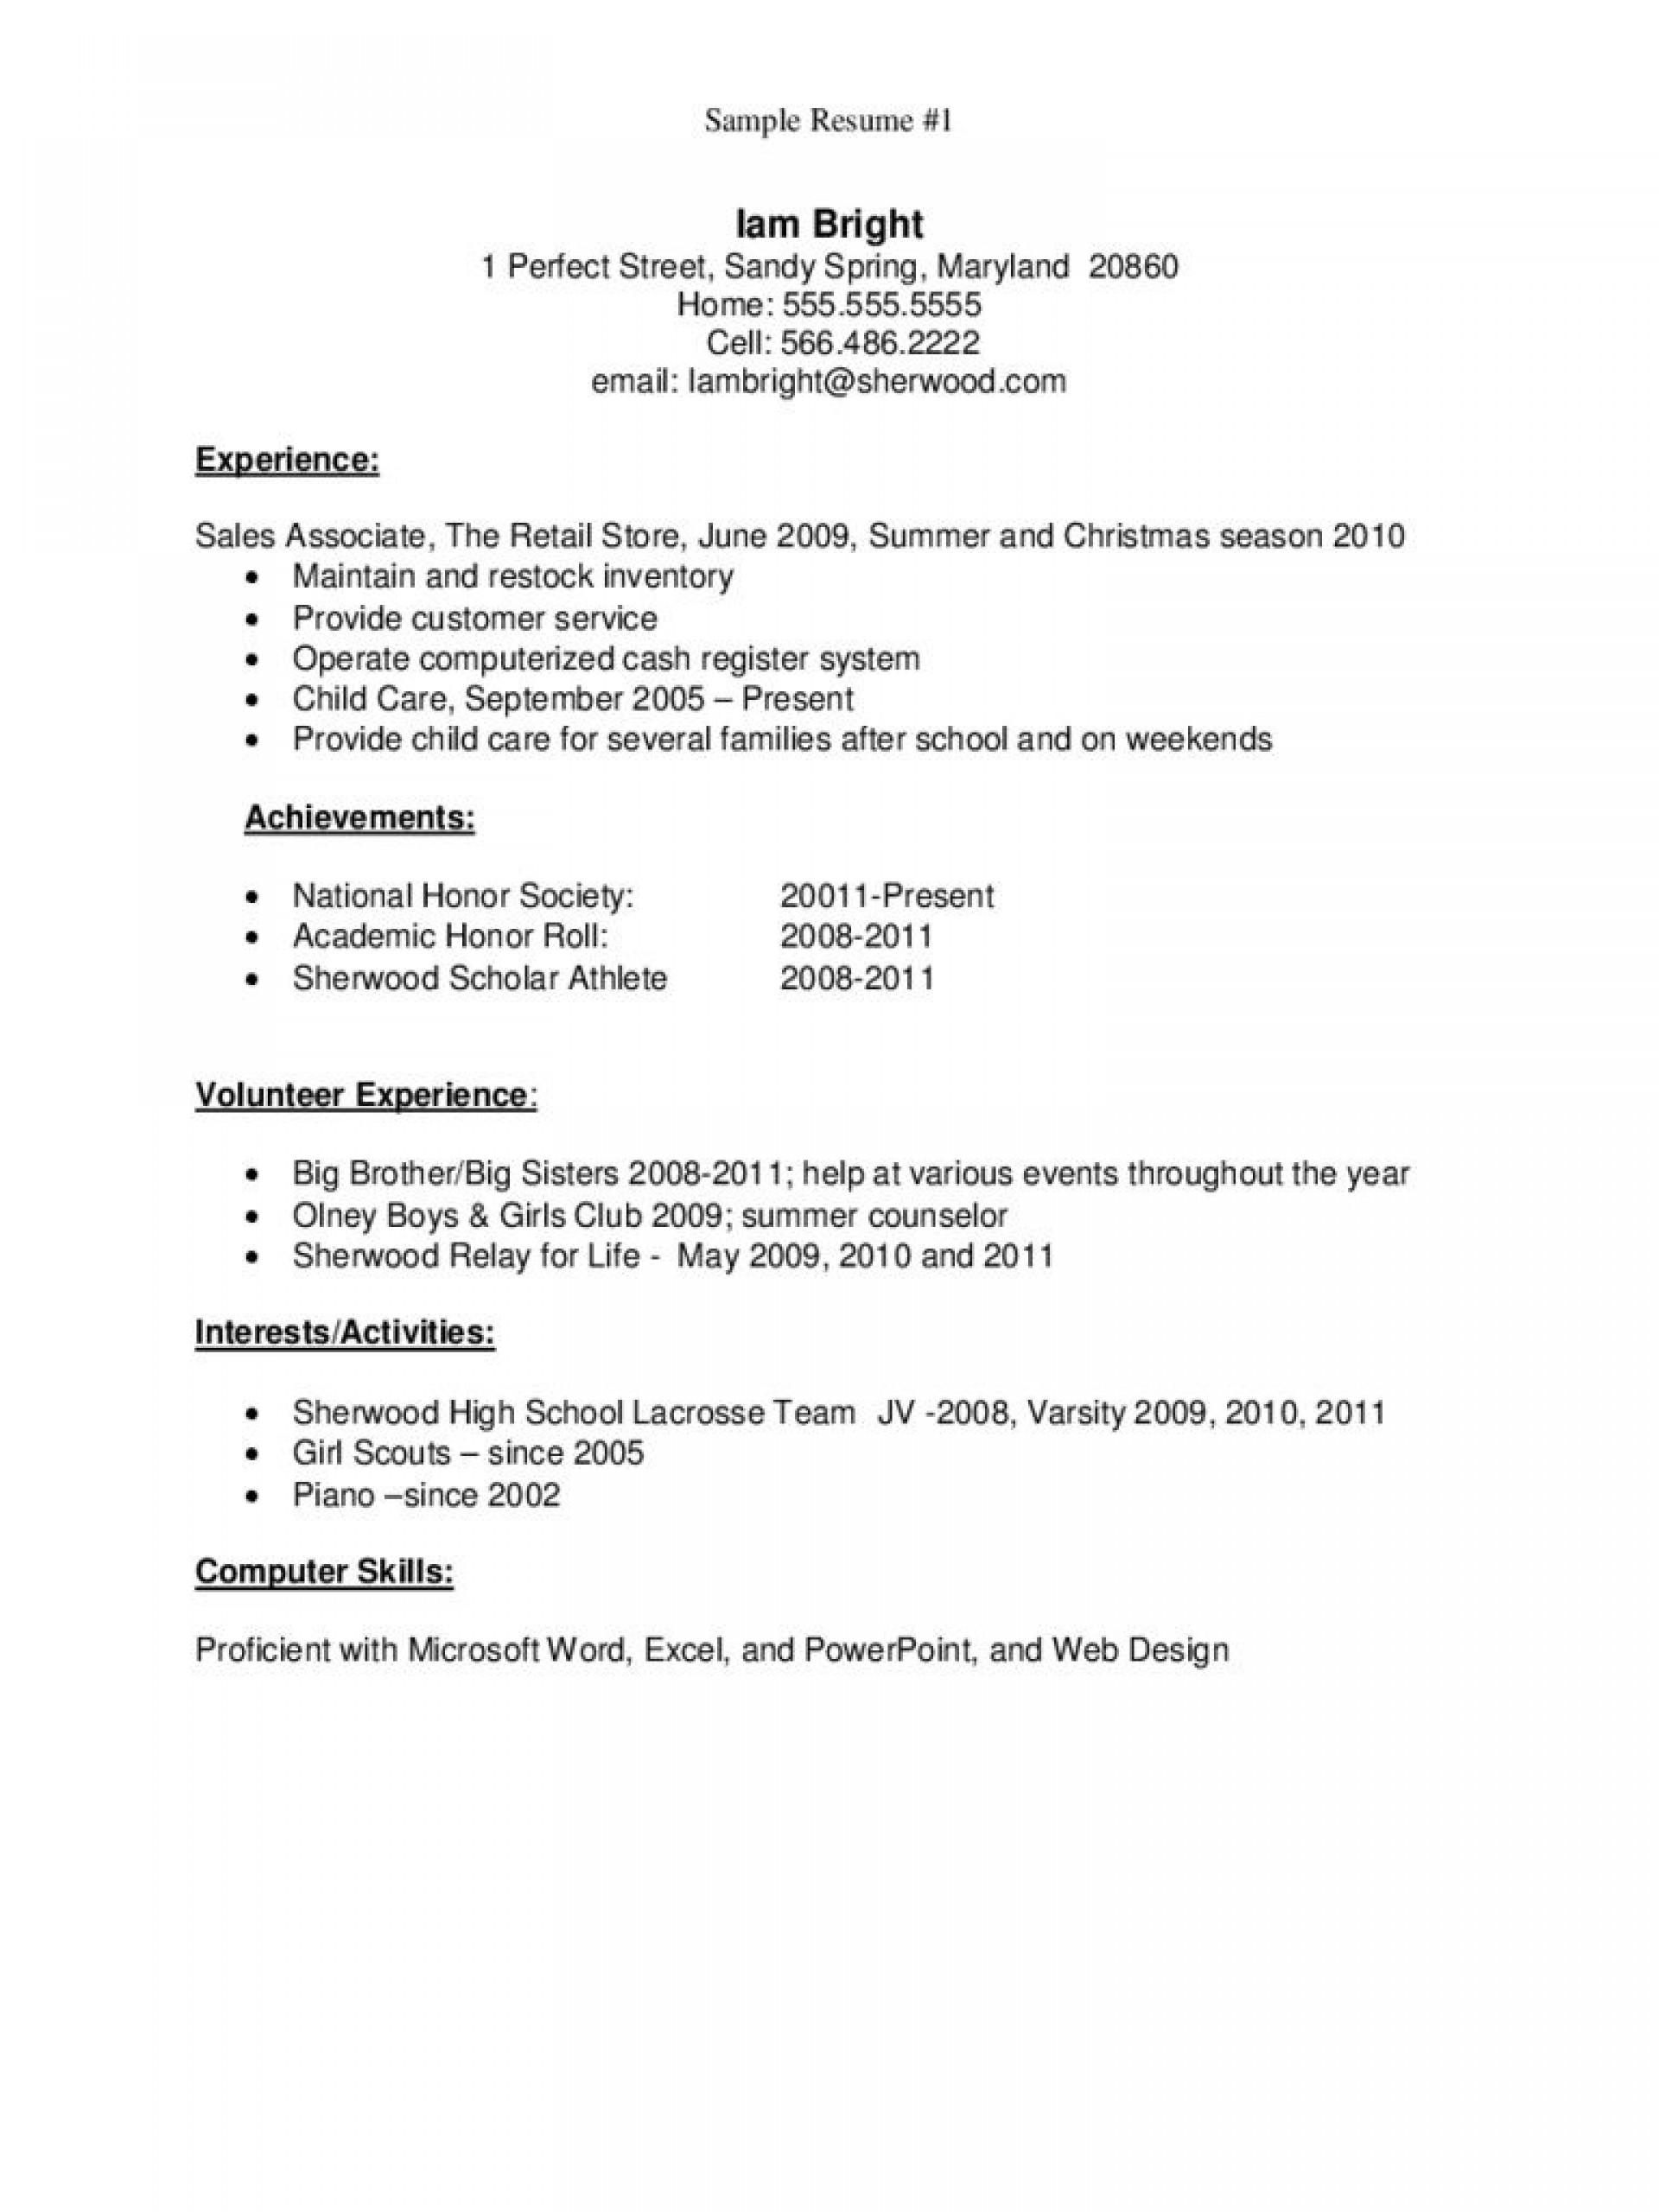 008 Wonderful Graduate School Resume Template Photo  Word Free1920